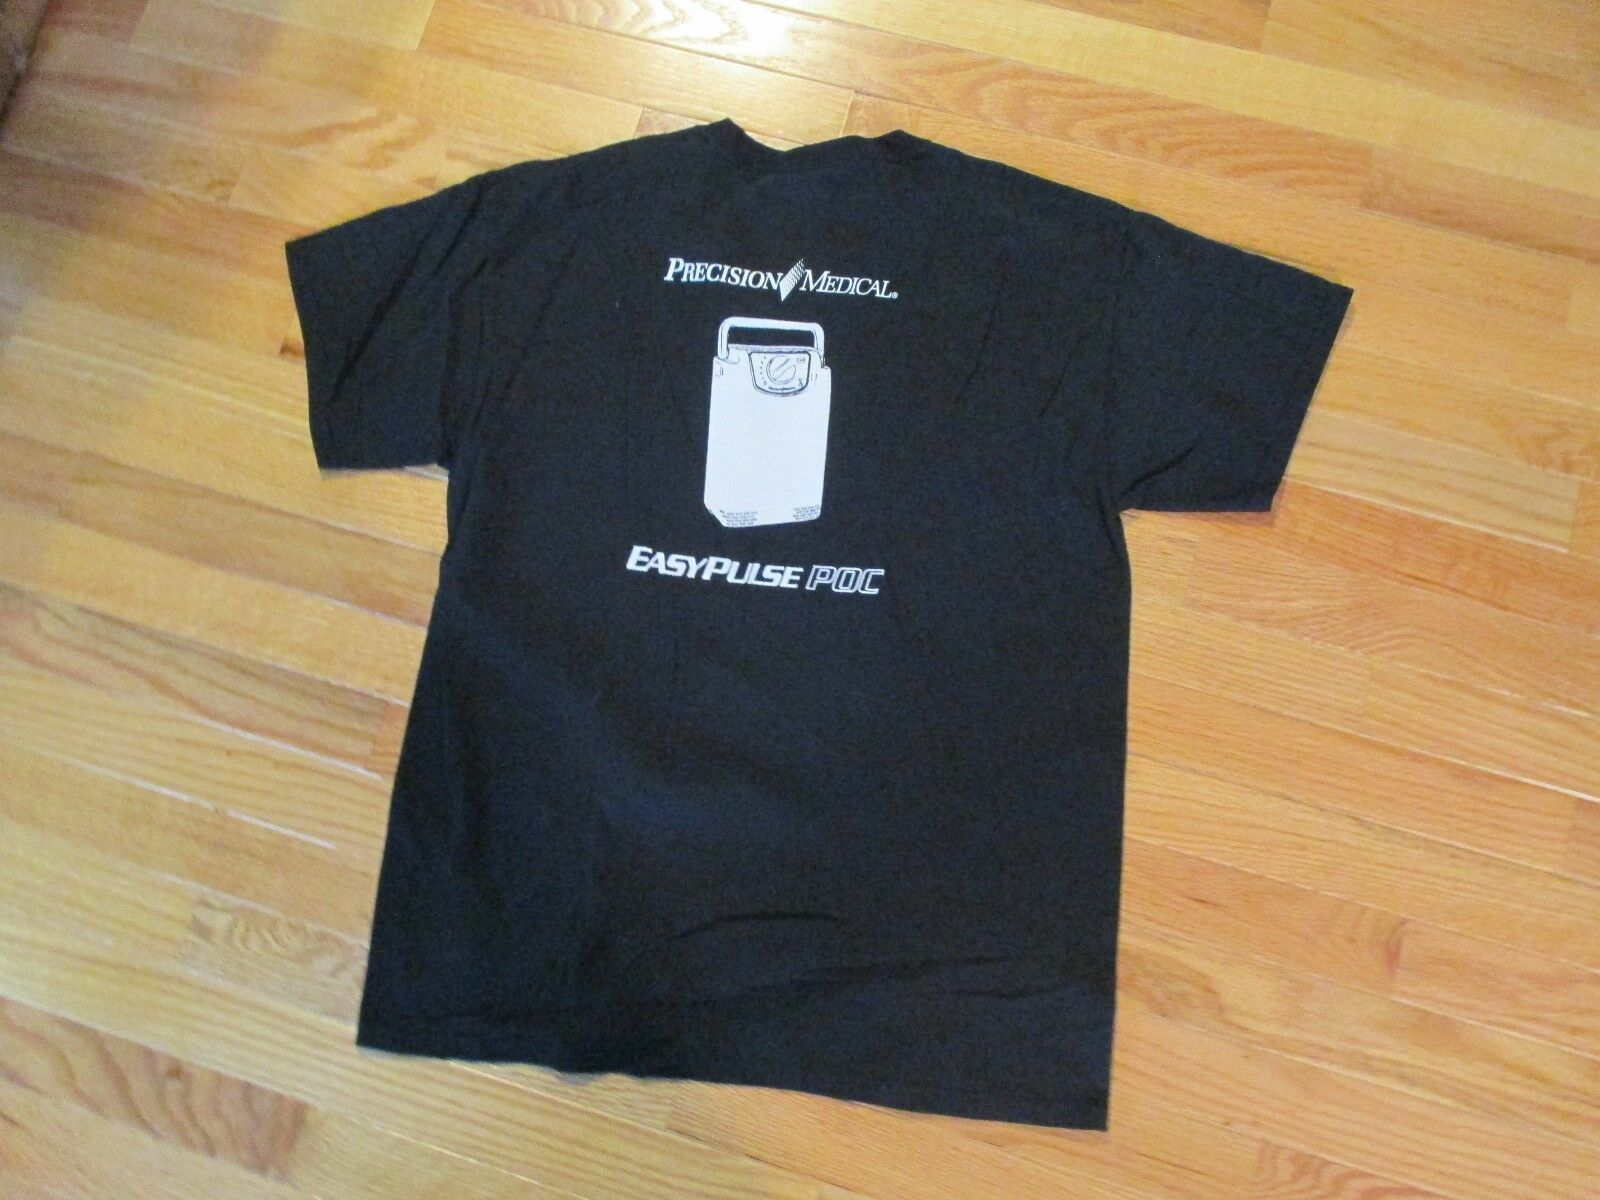 Got Oxygen Precision Medical Easy pulse POC T Shirt Size L